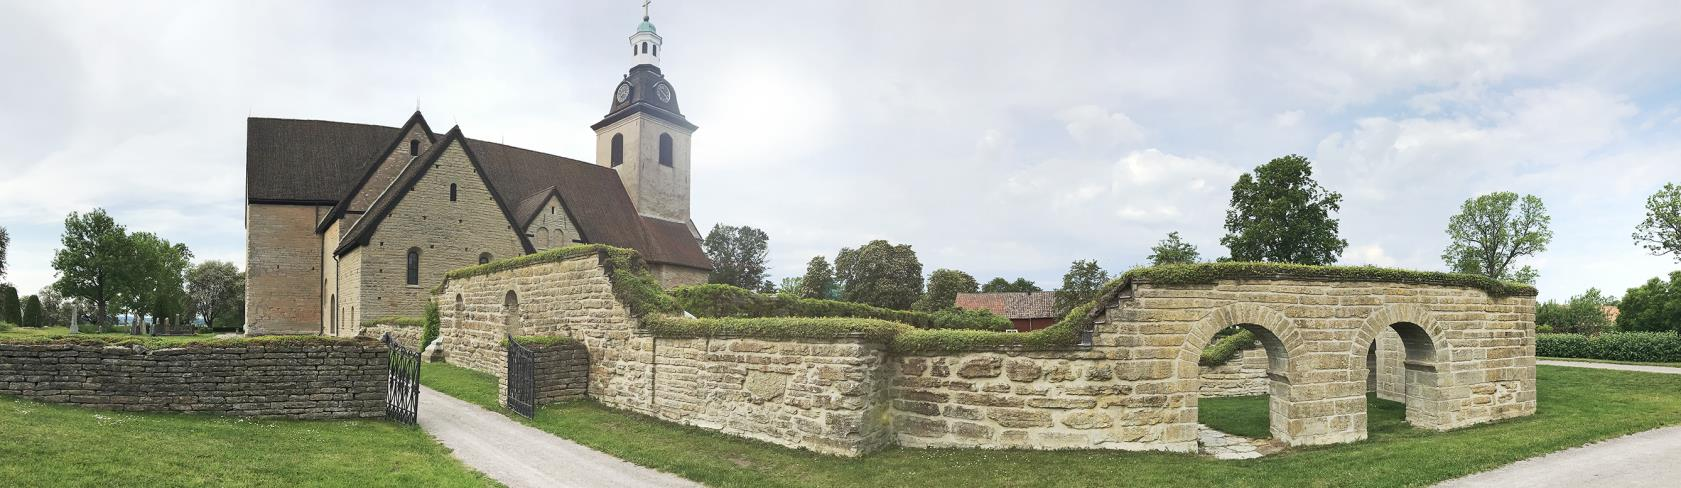 vreta kloster dejting)